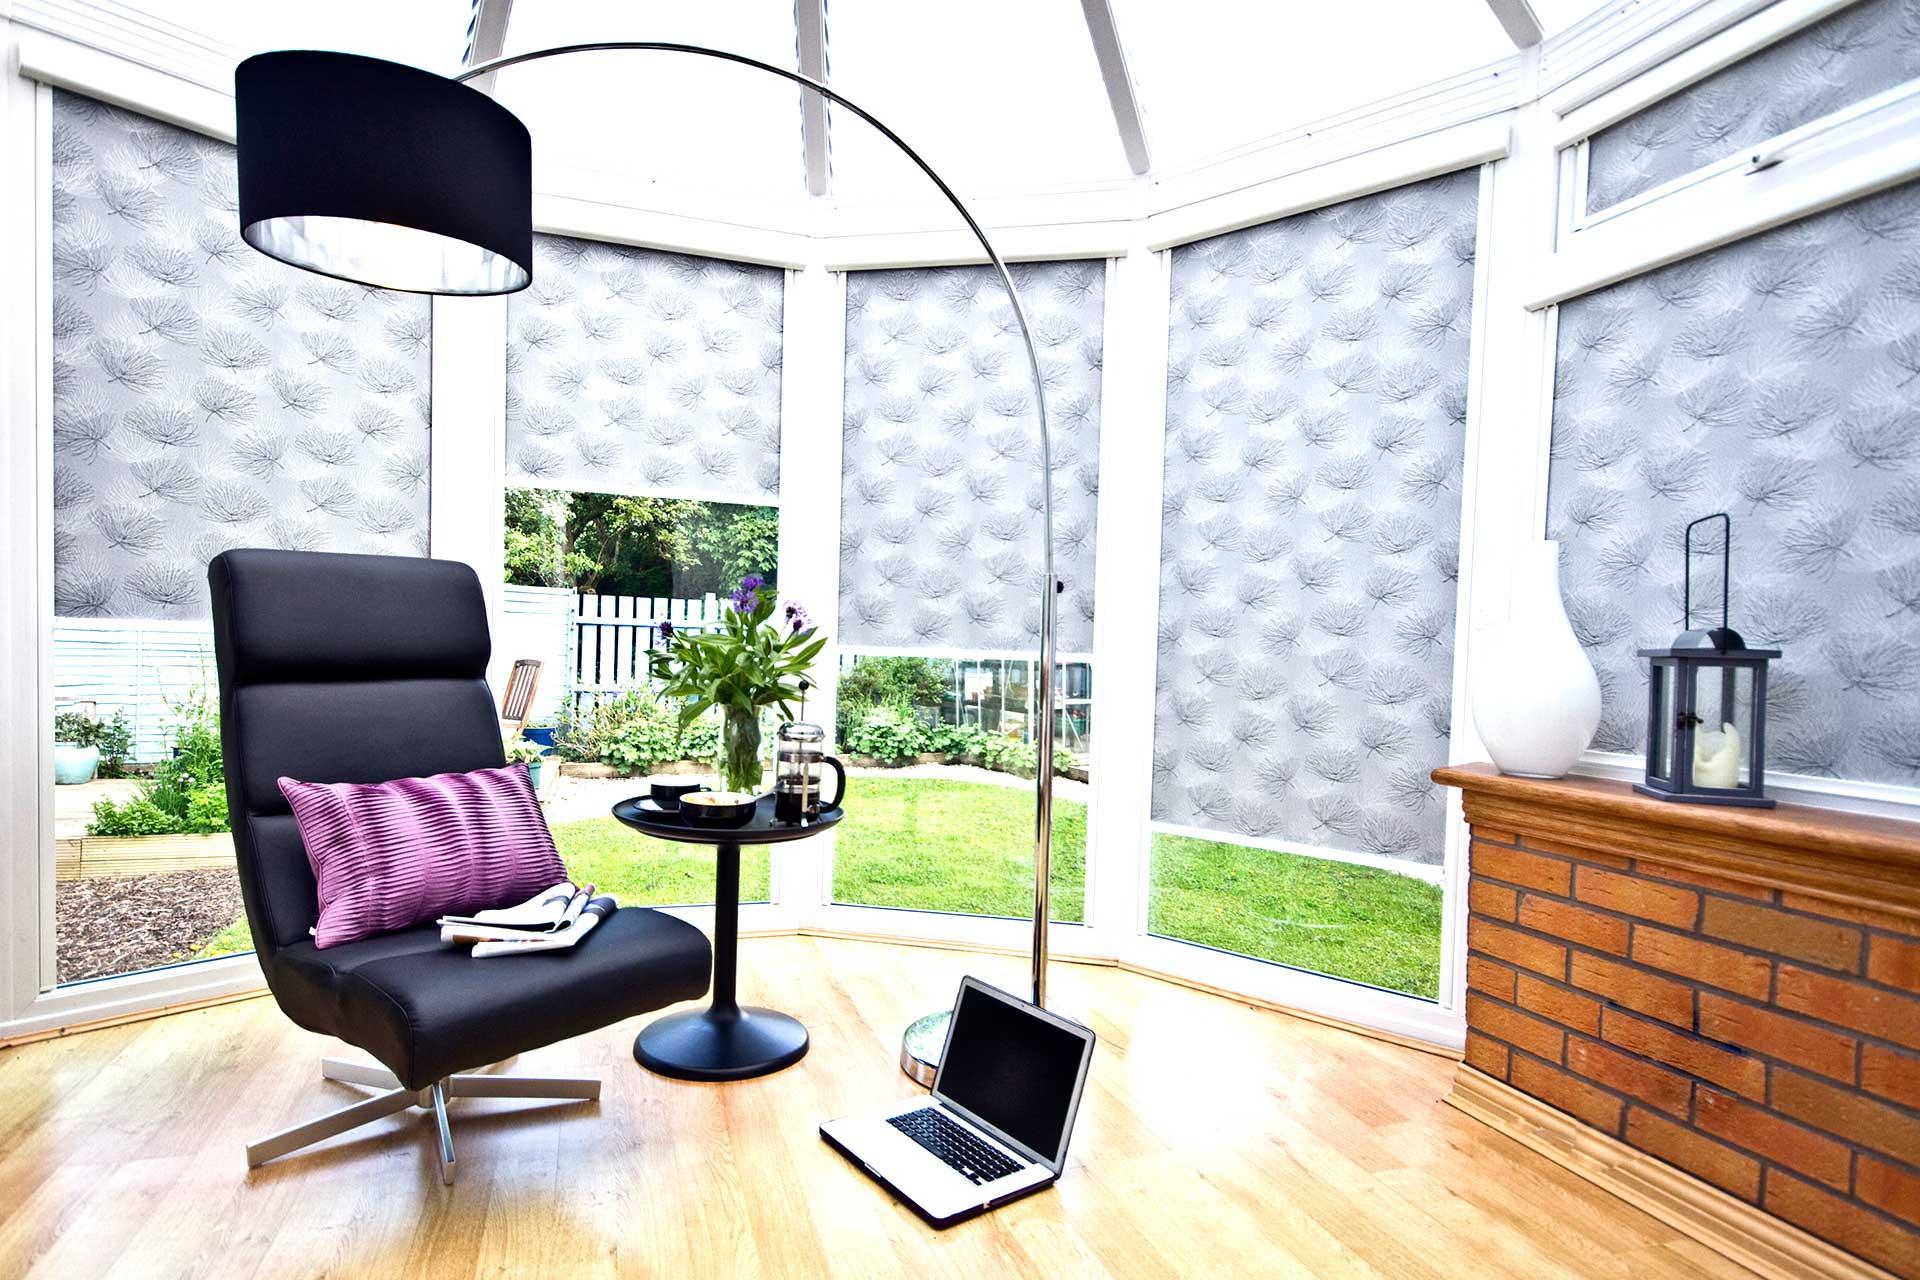 Intu roller conservatory blinds by Direct Order blinds